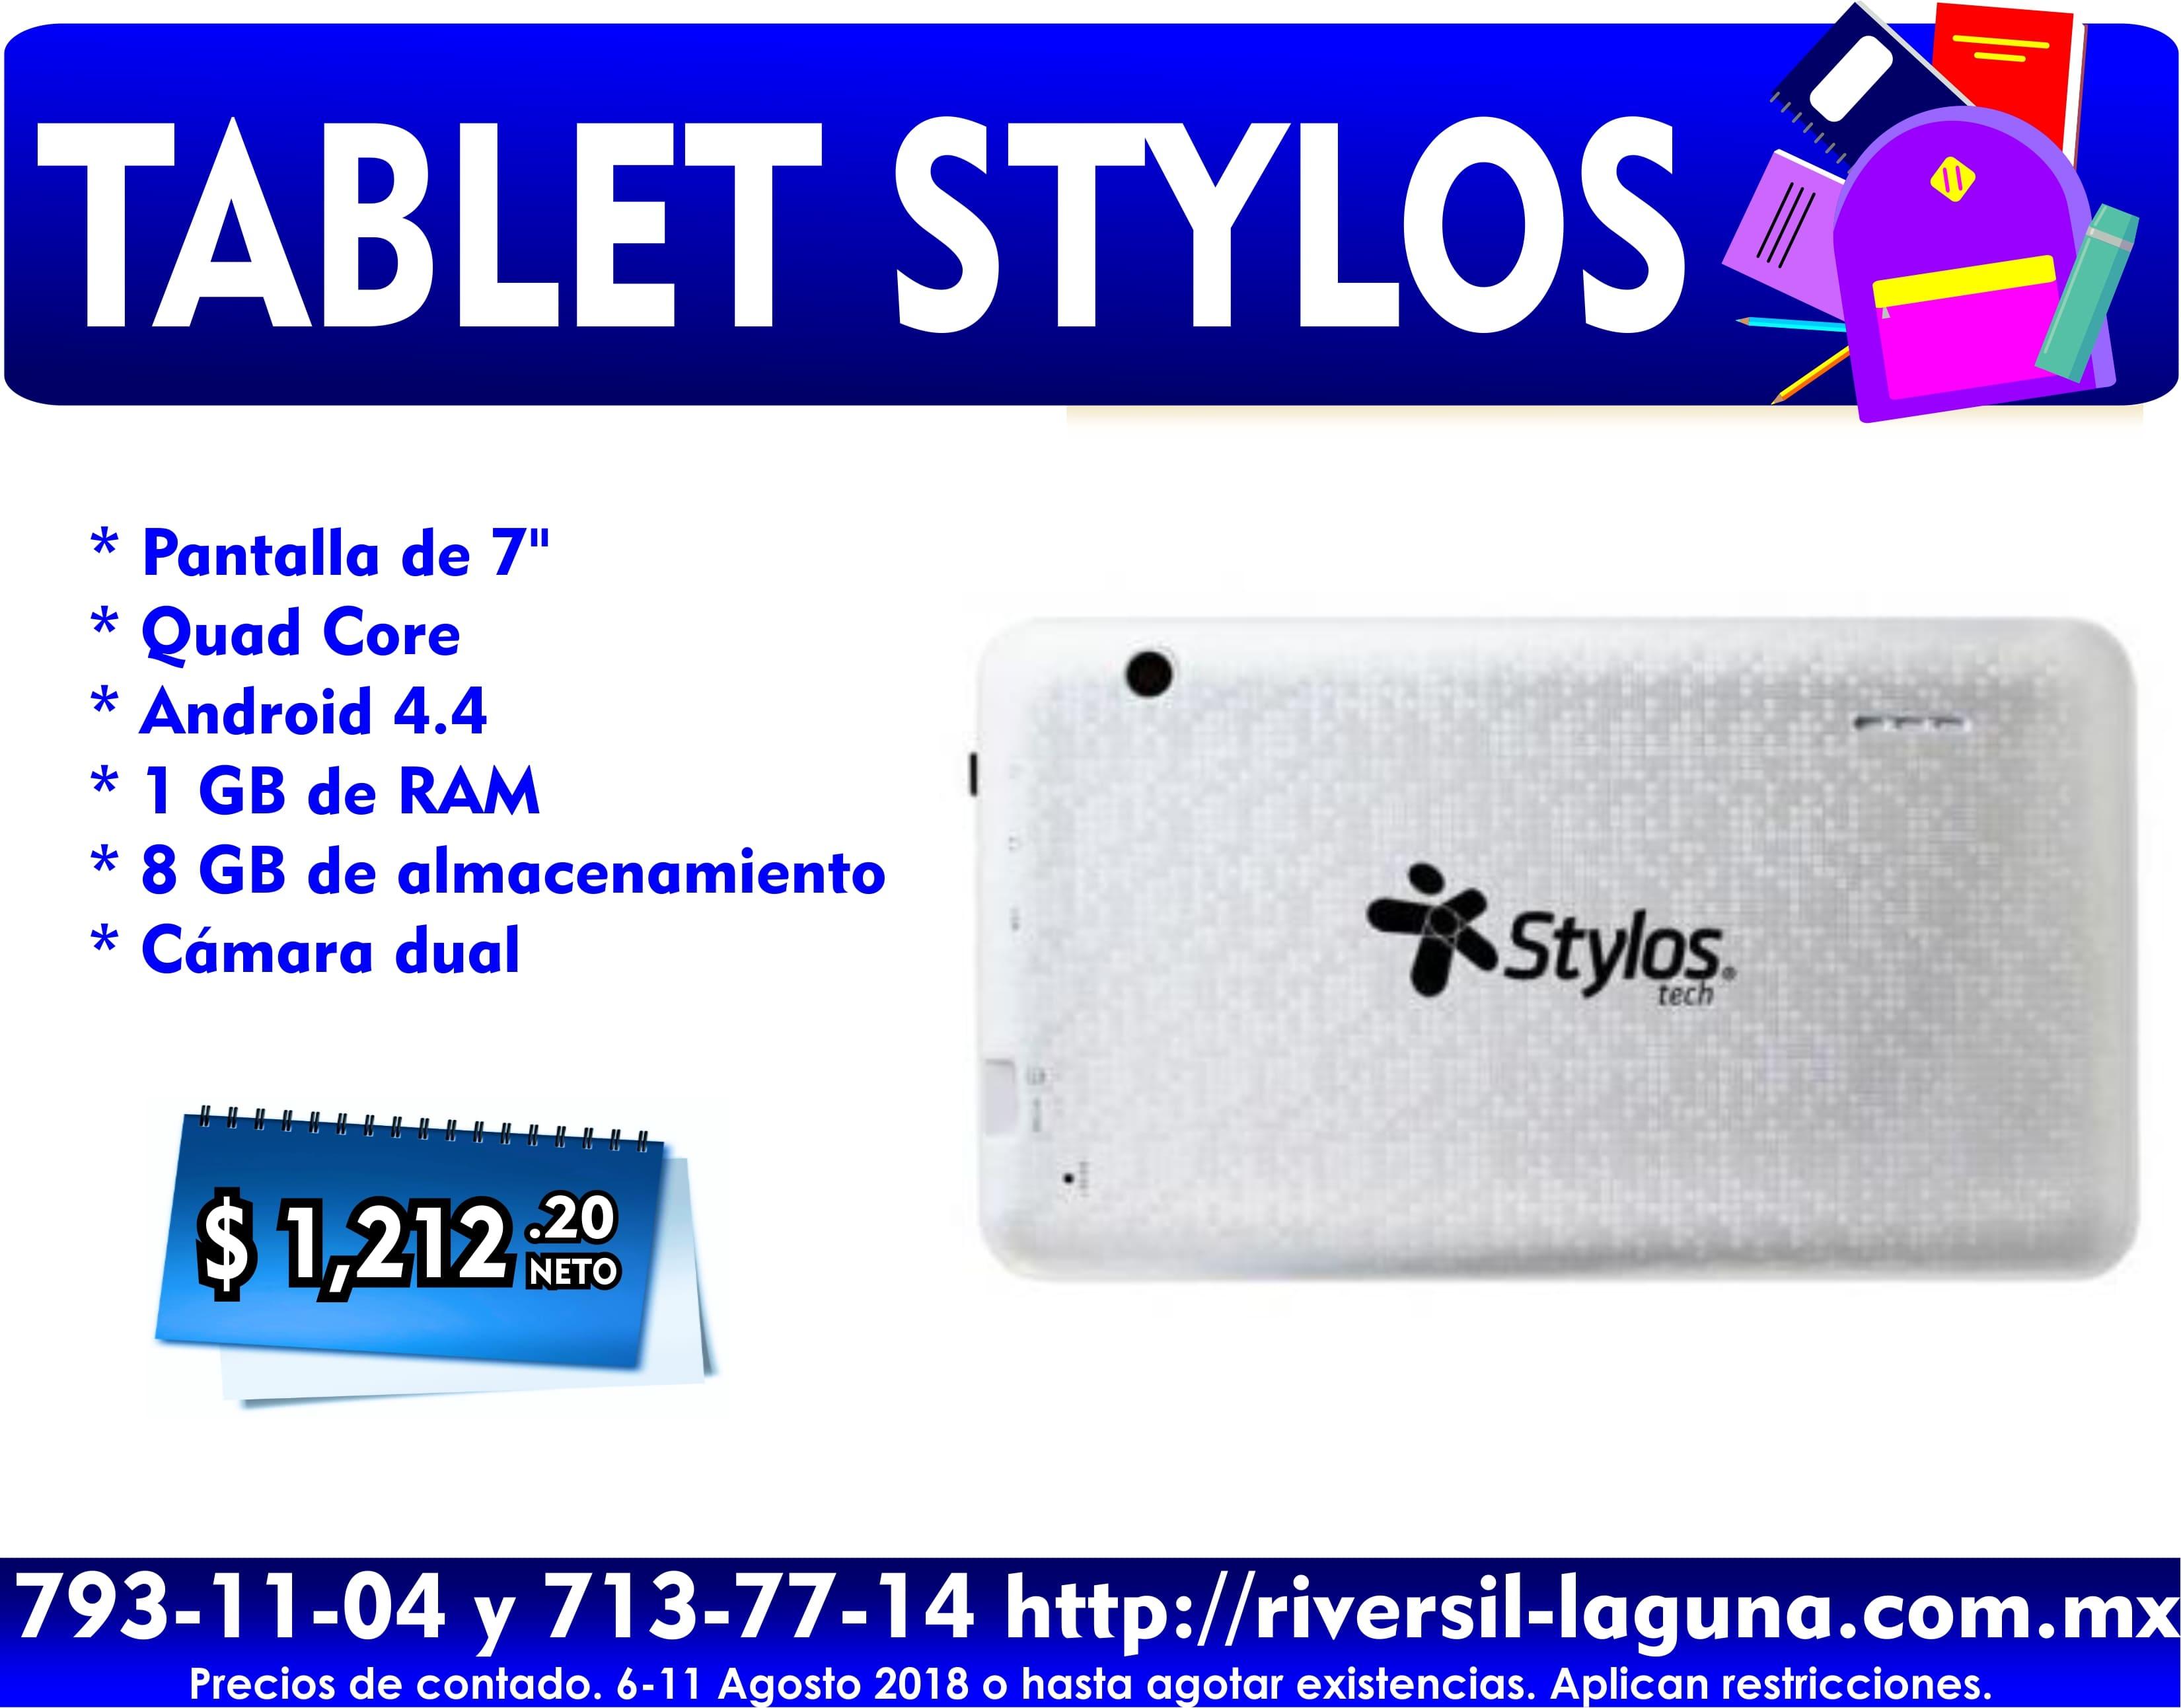 TABLET STYLOS PLATA